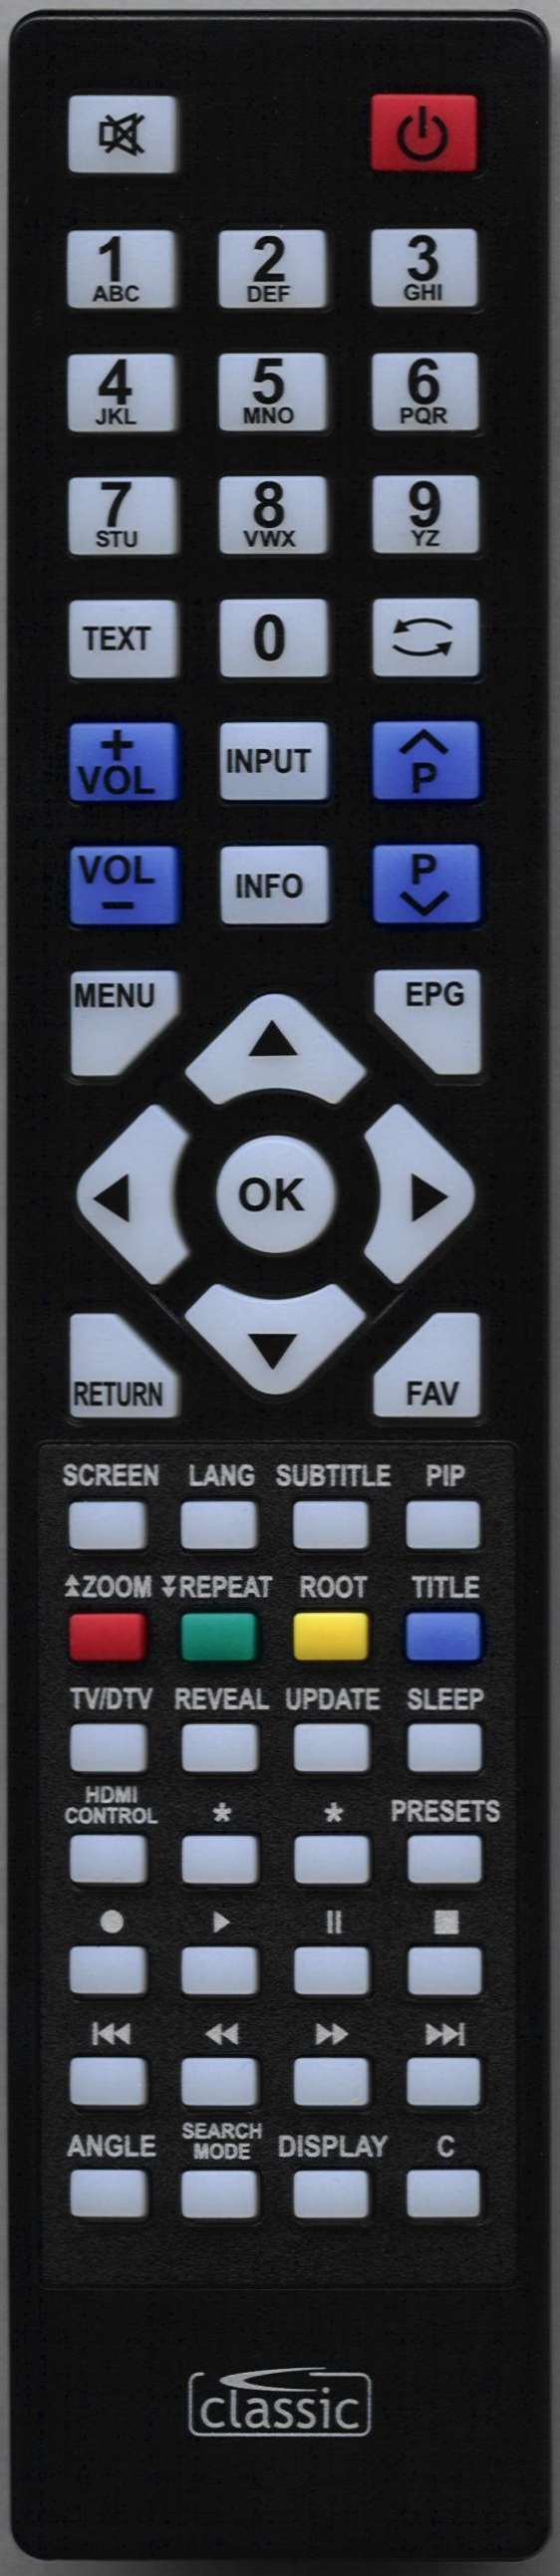 MATSUI MAT42LW507 Remote Control